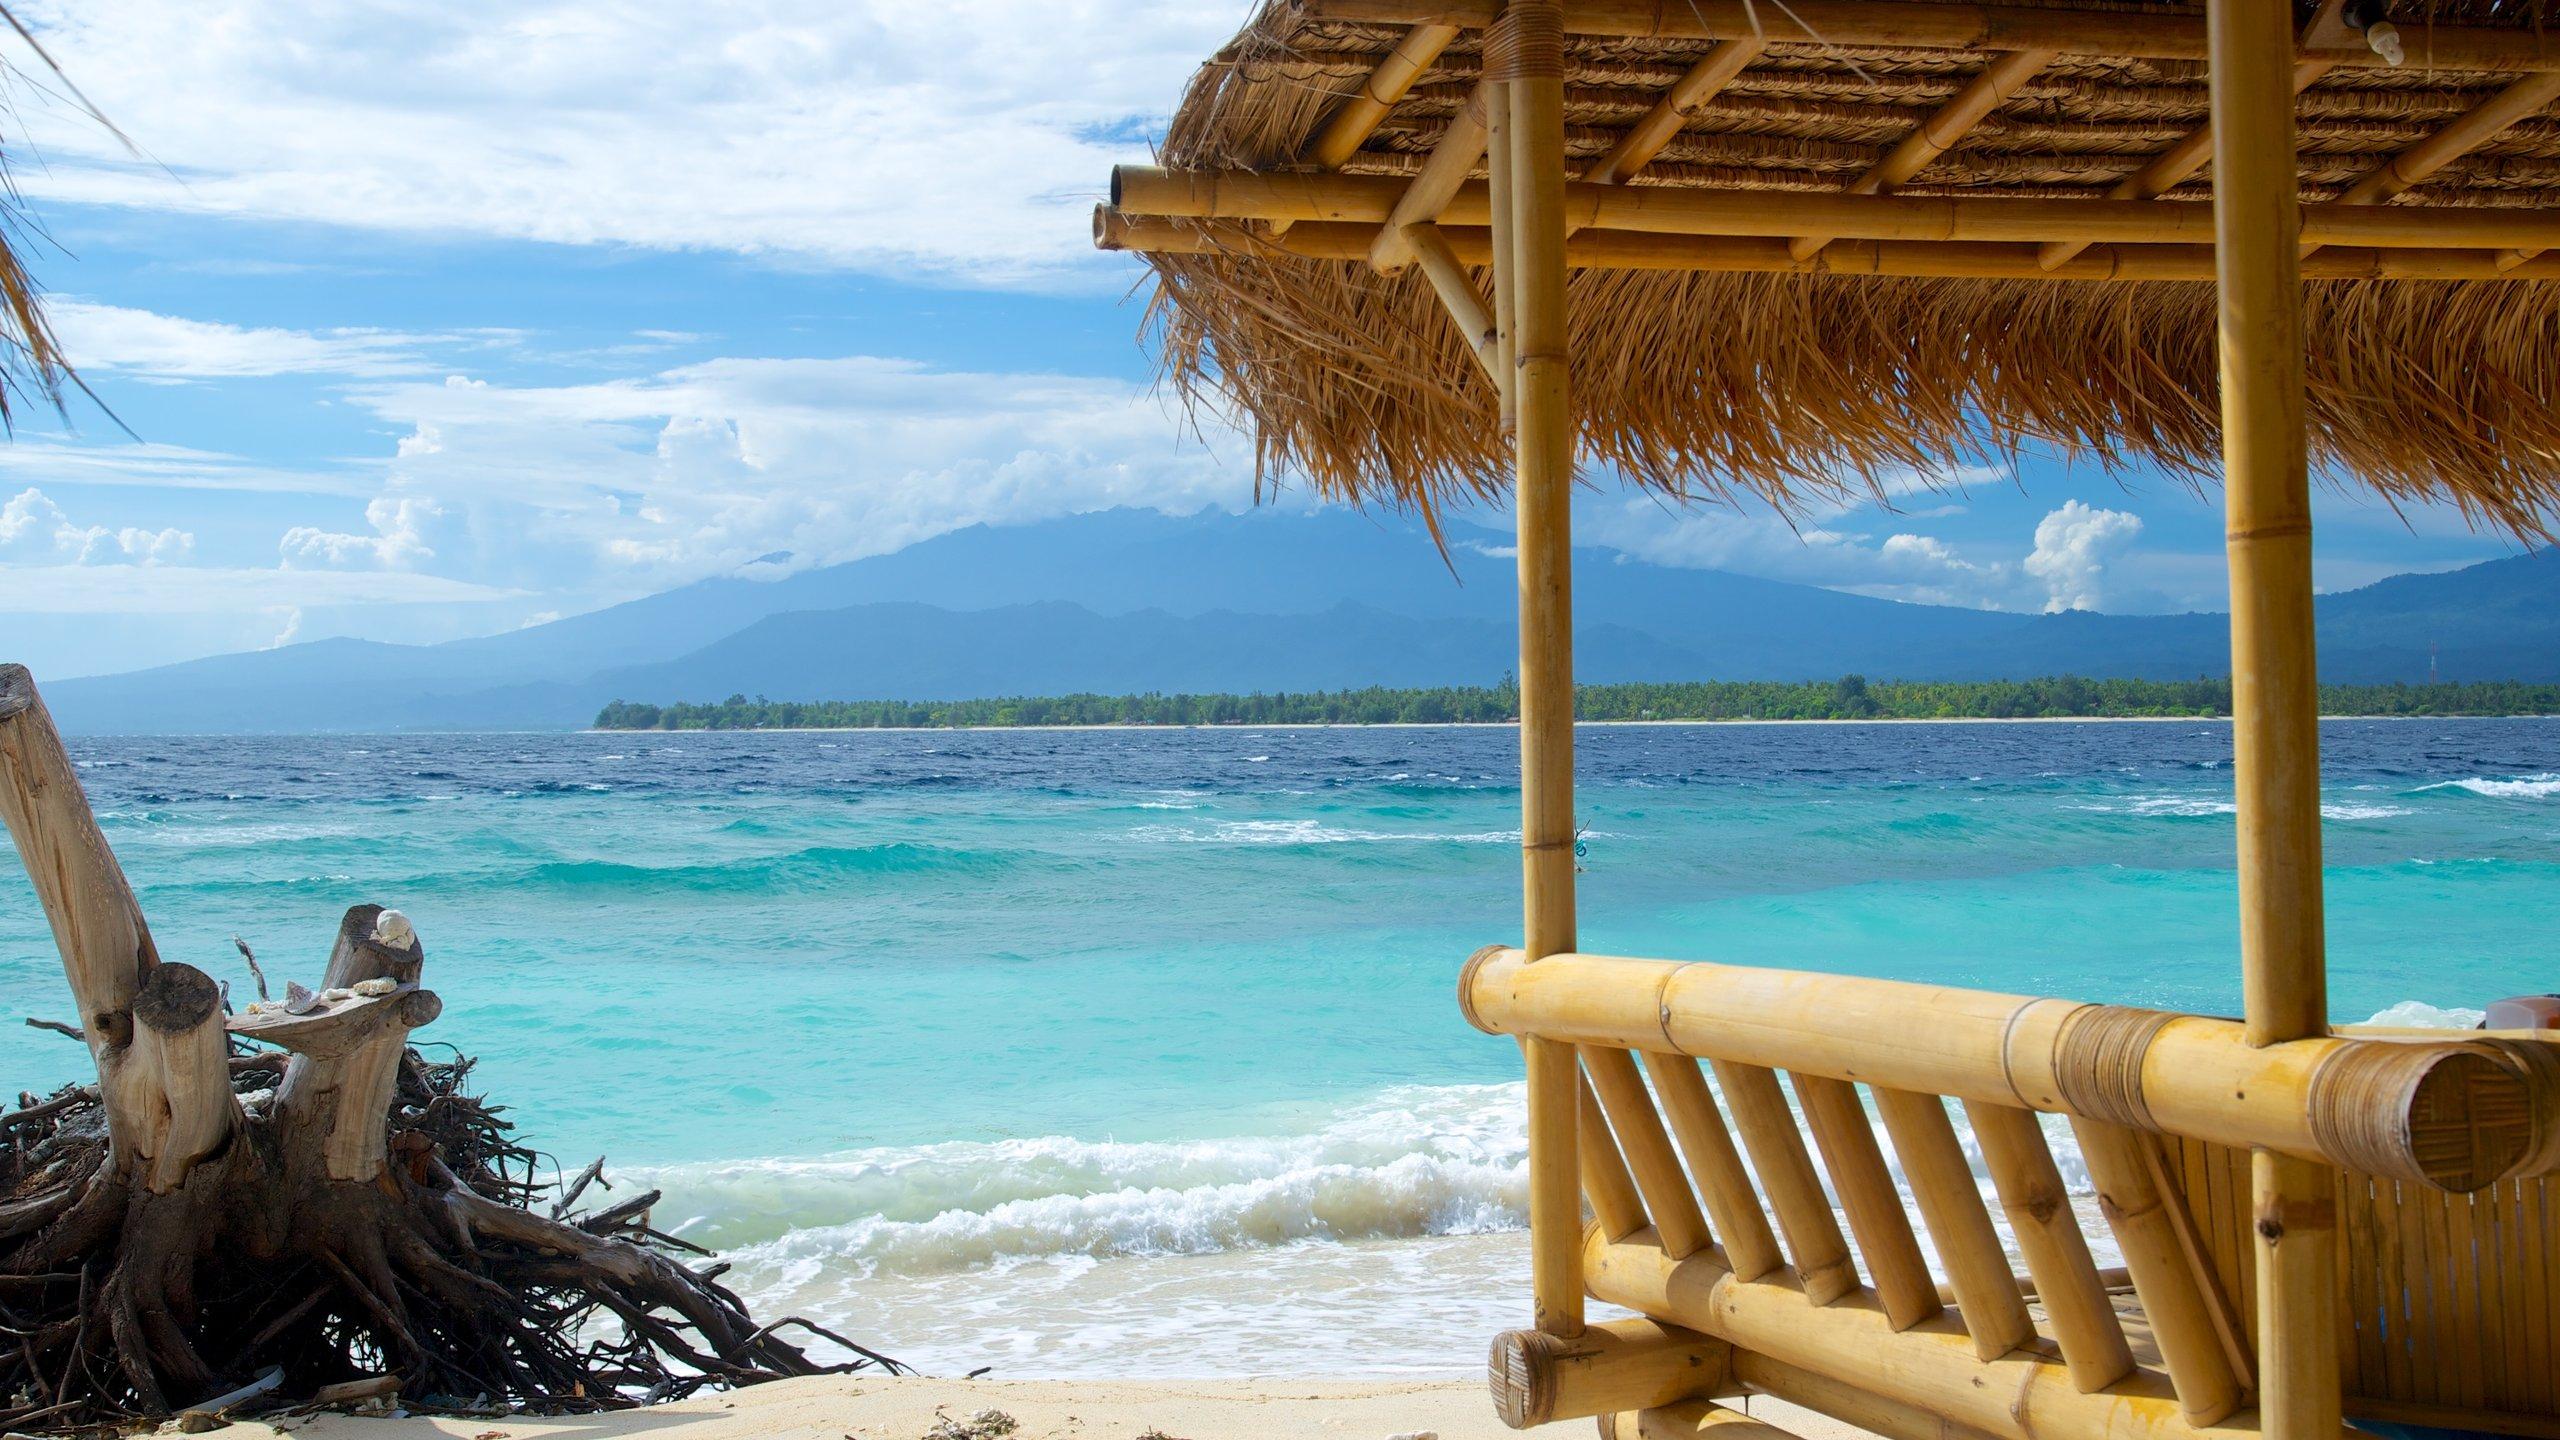 Lombok, West Nusa Tenggara, Indonesia